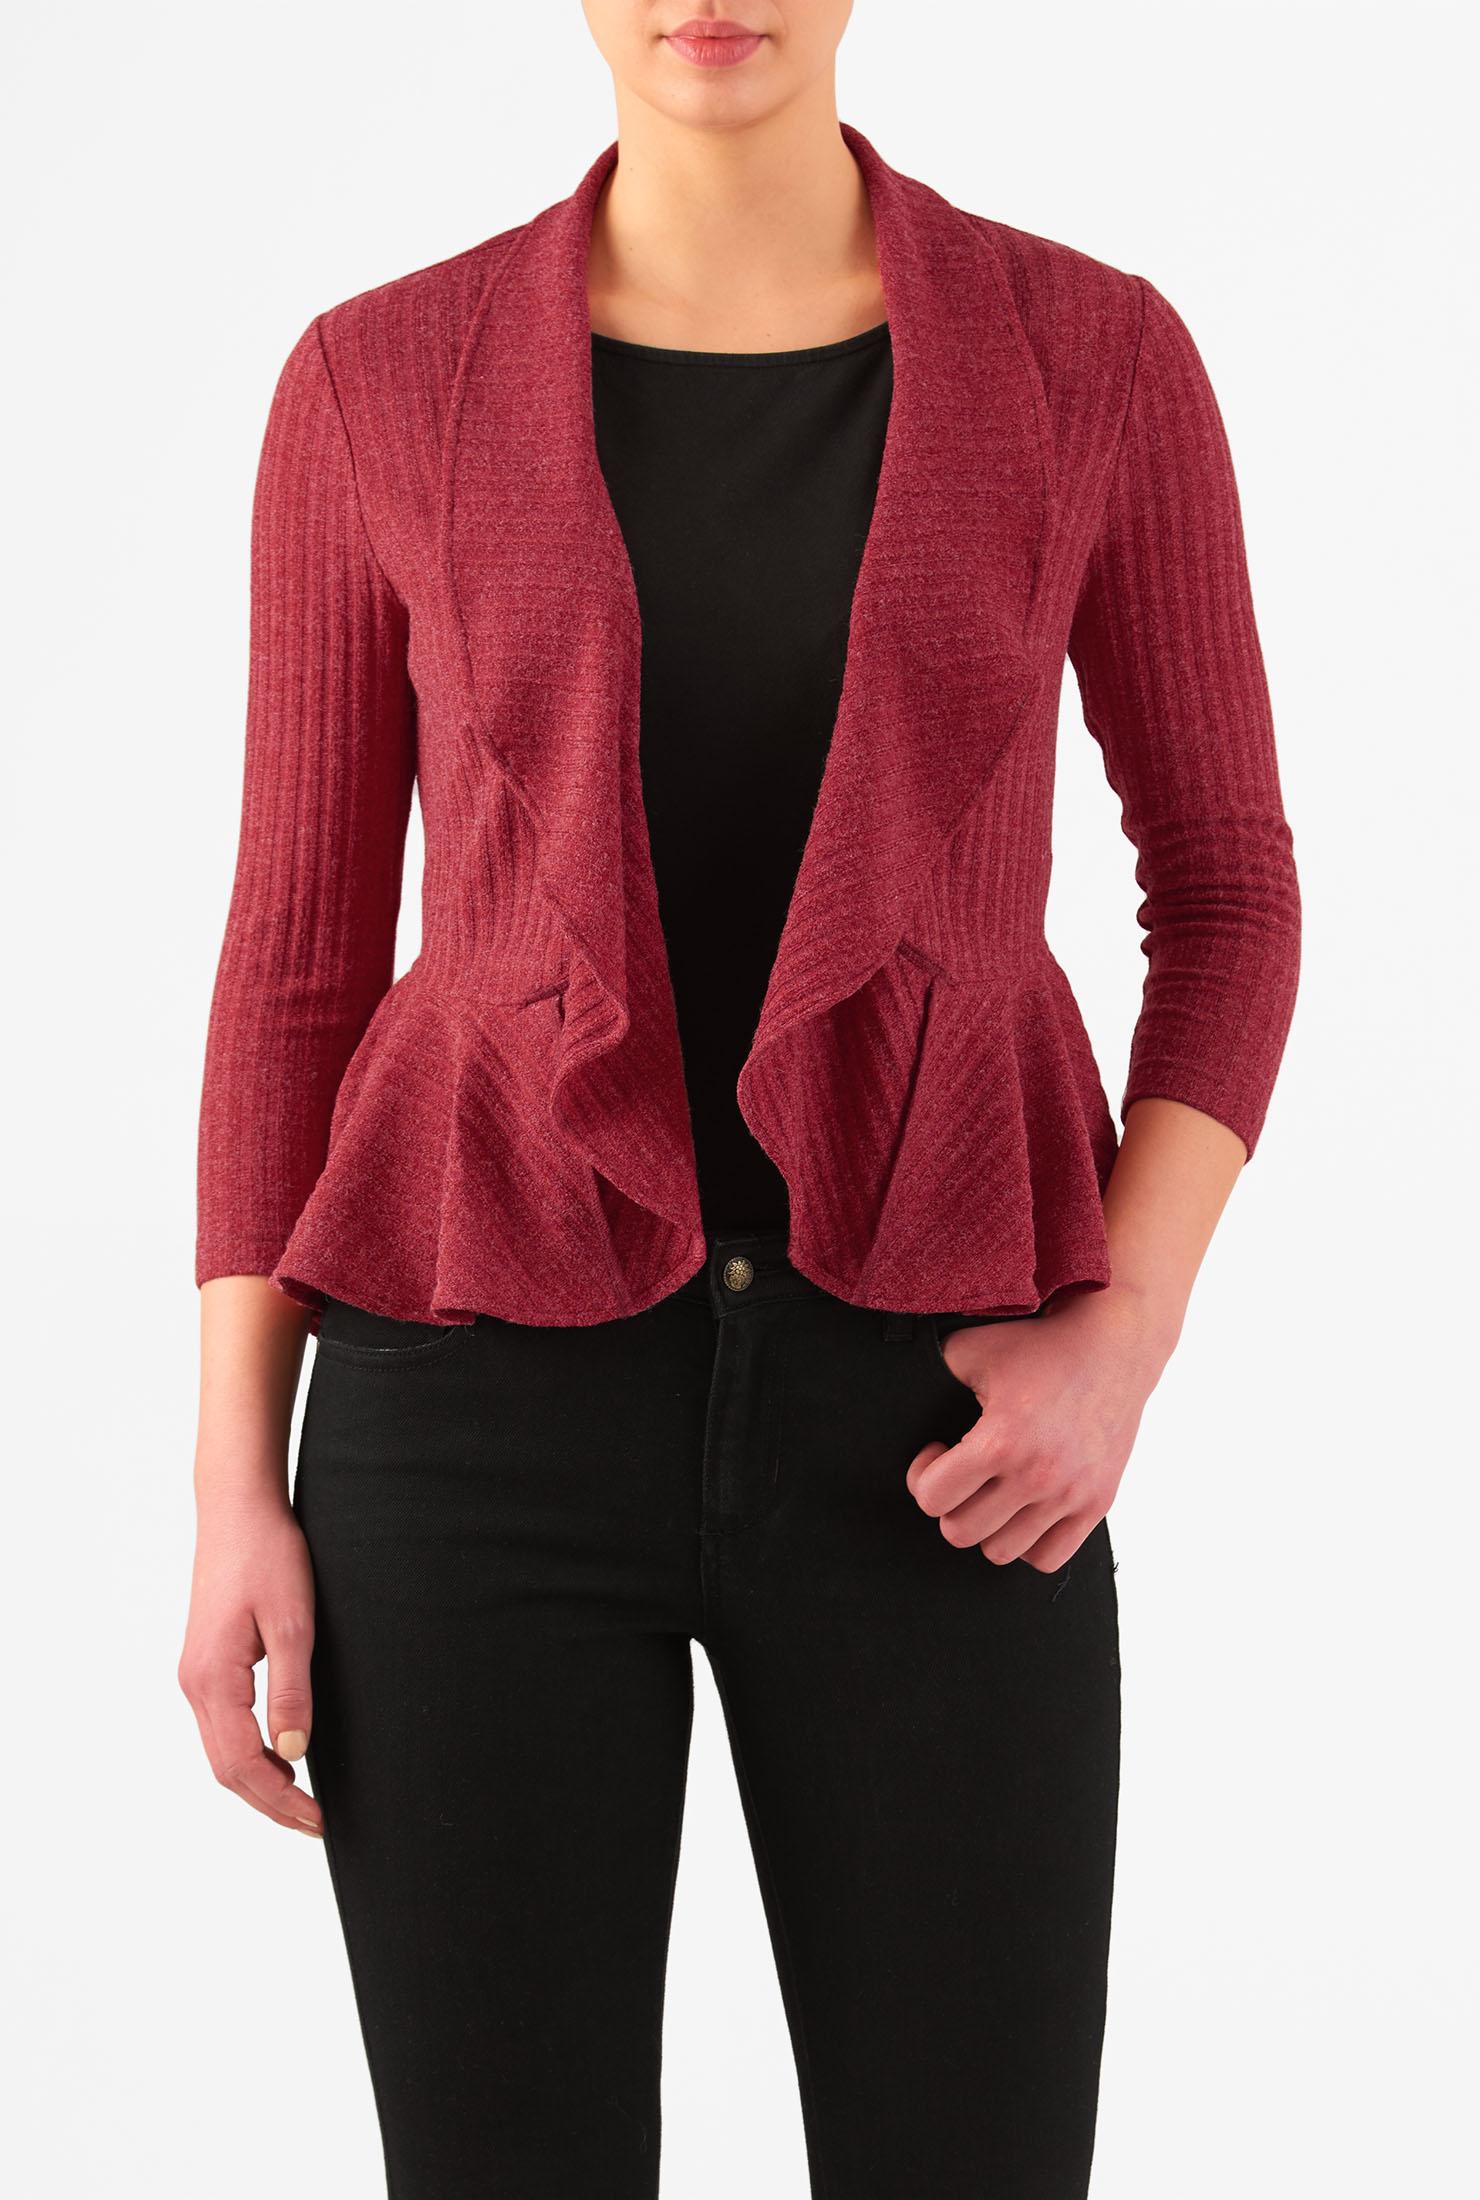 eShakti Women's Ruffle peplum rib sweater knit cardigan CL0046621